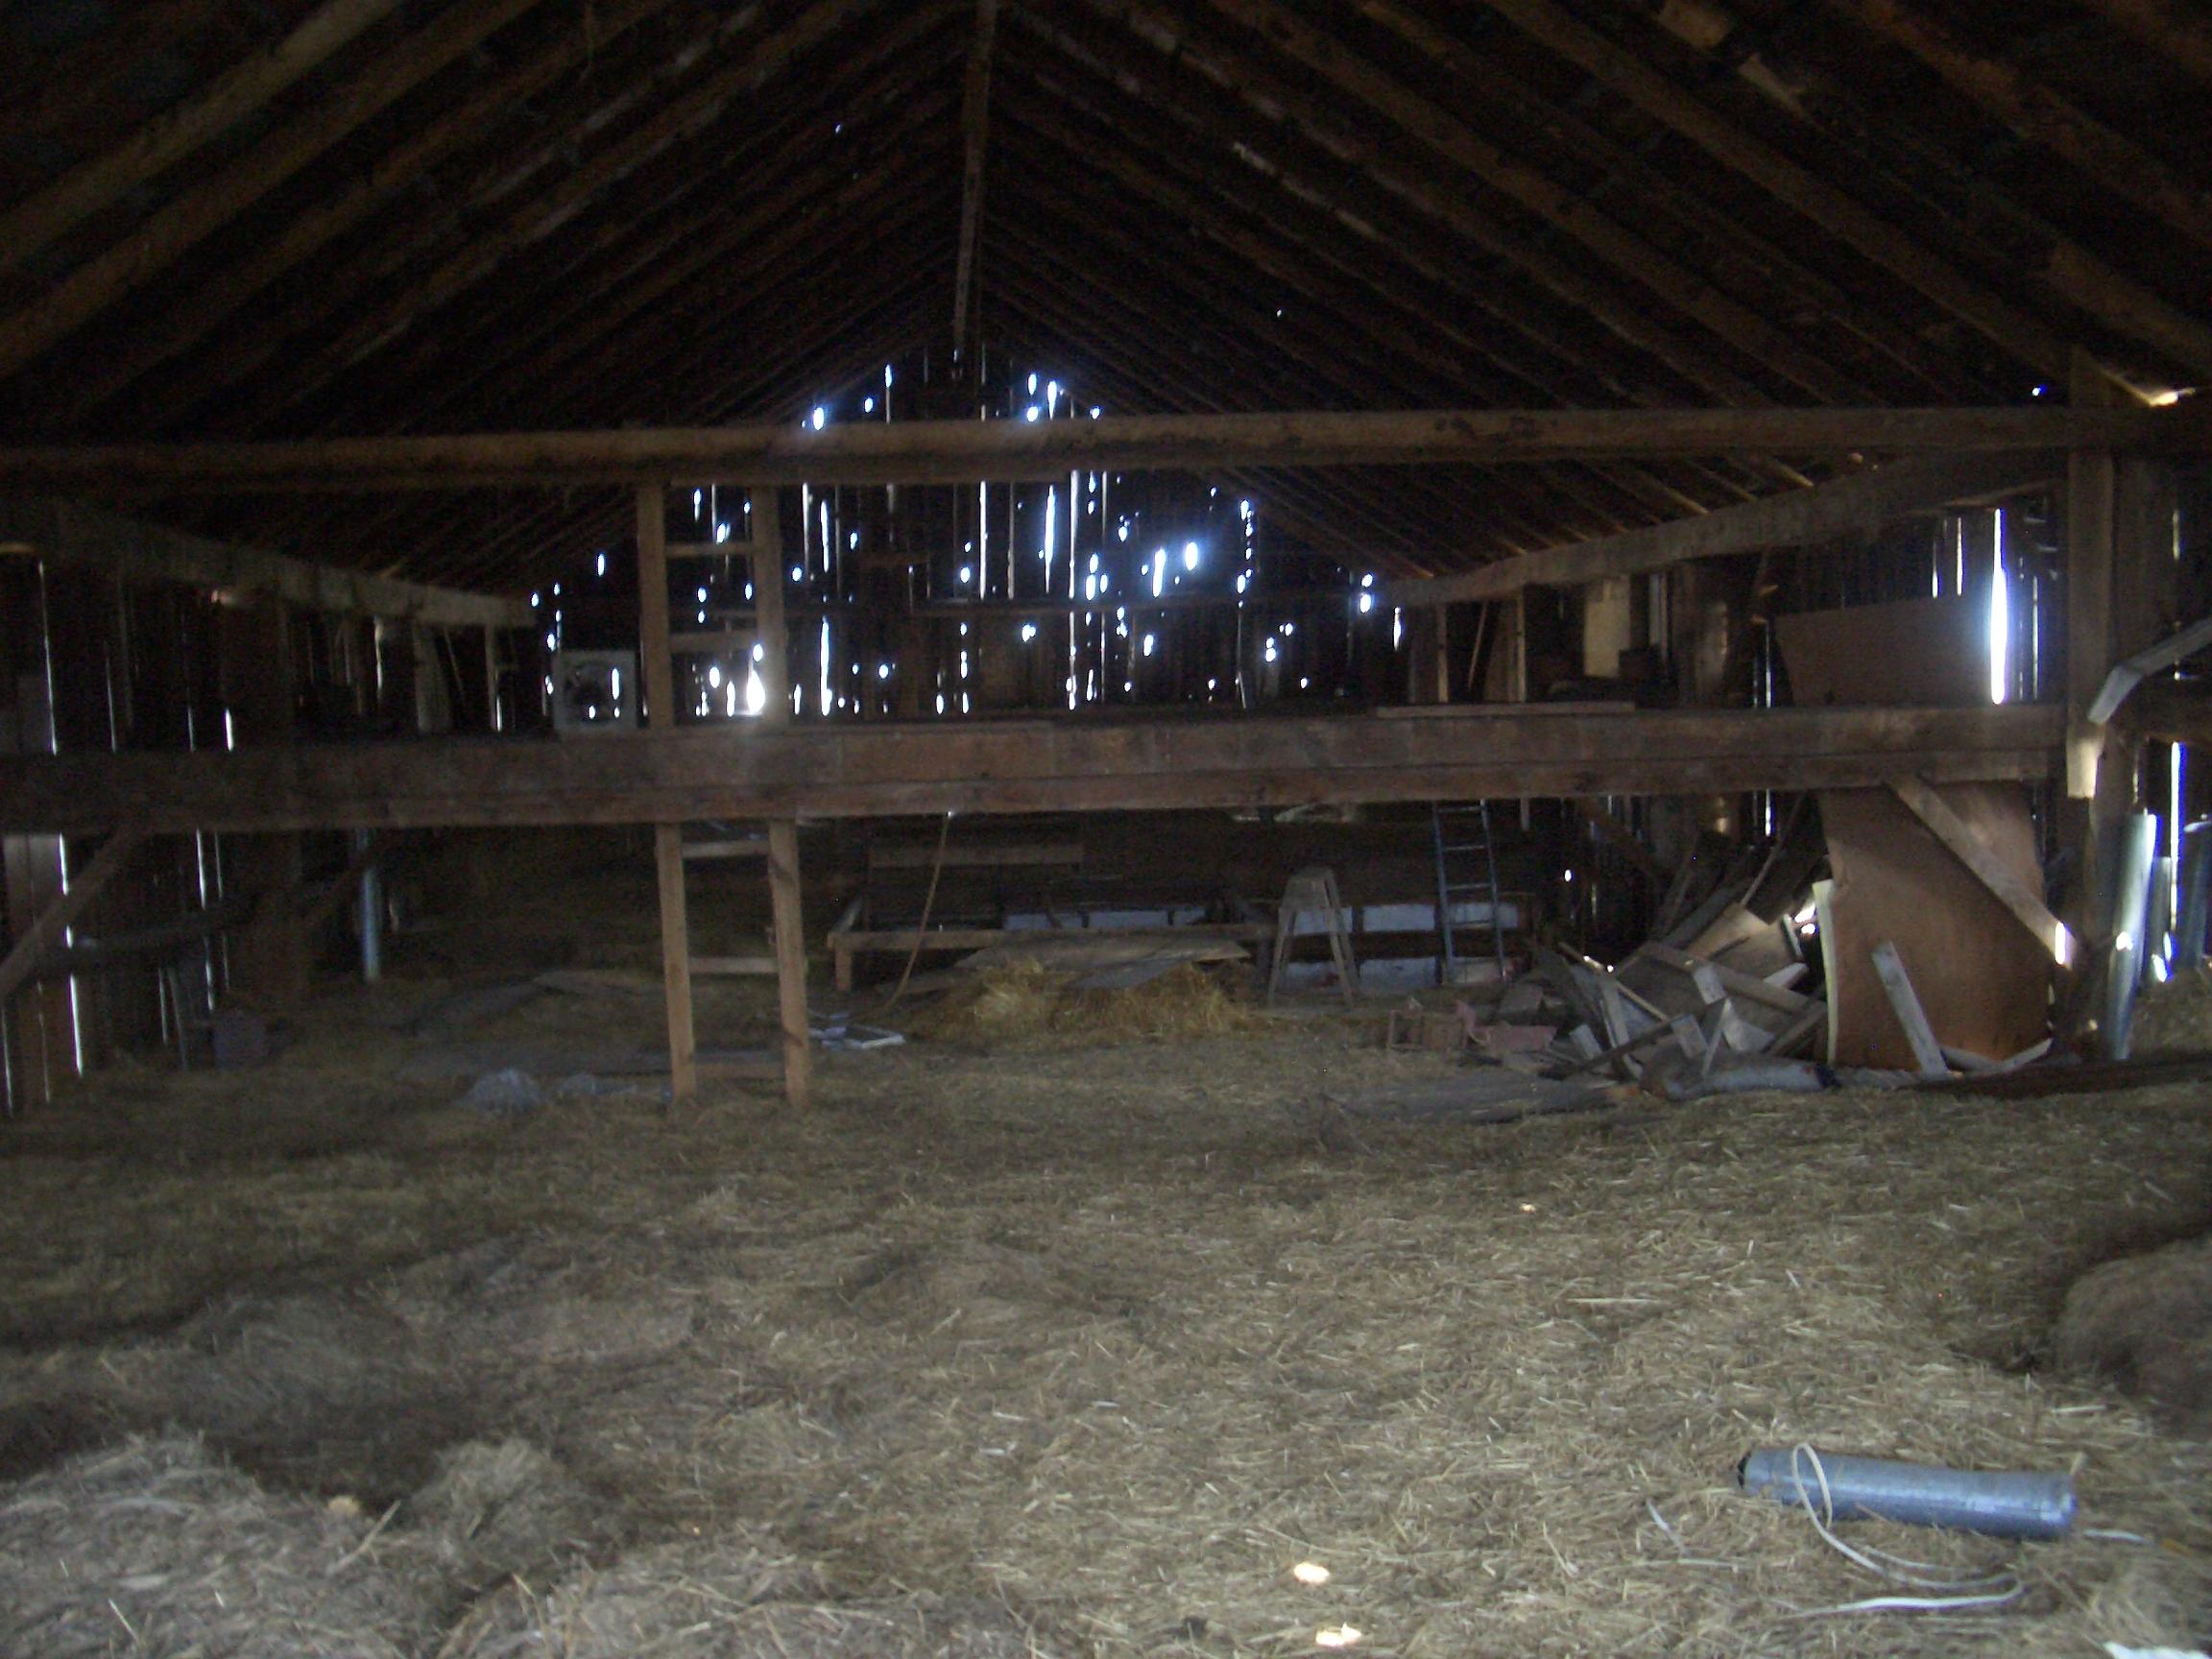 Inside Of A Barn : Inside an old barn image pixels